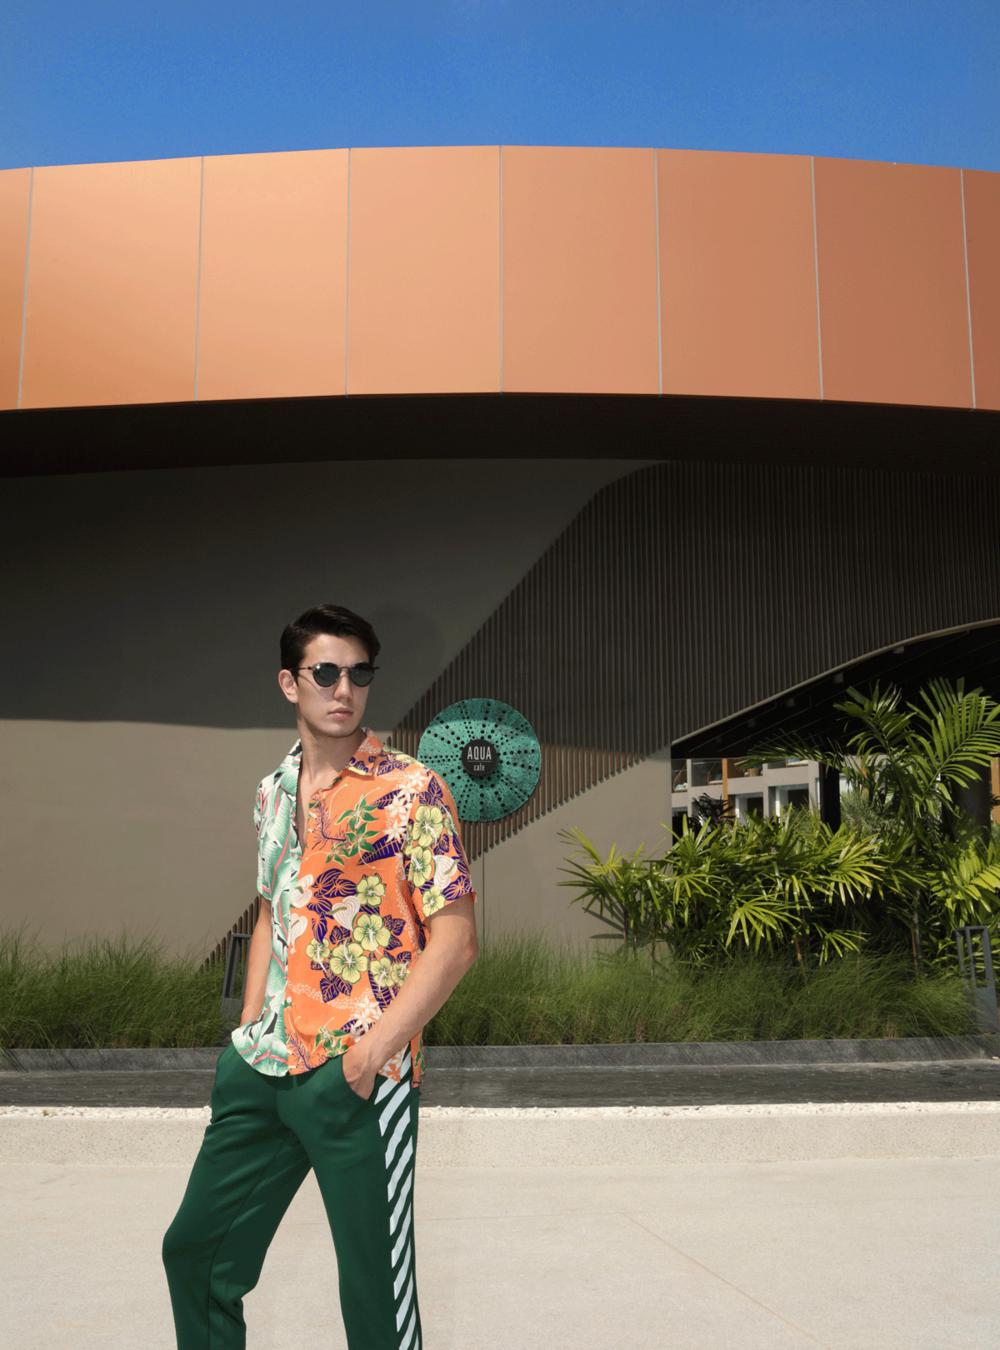 shirt : Leisure Projects / pants : CV_homme / sunglasses : TAVAT